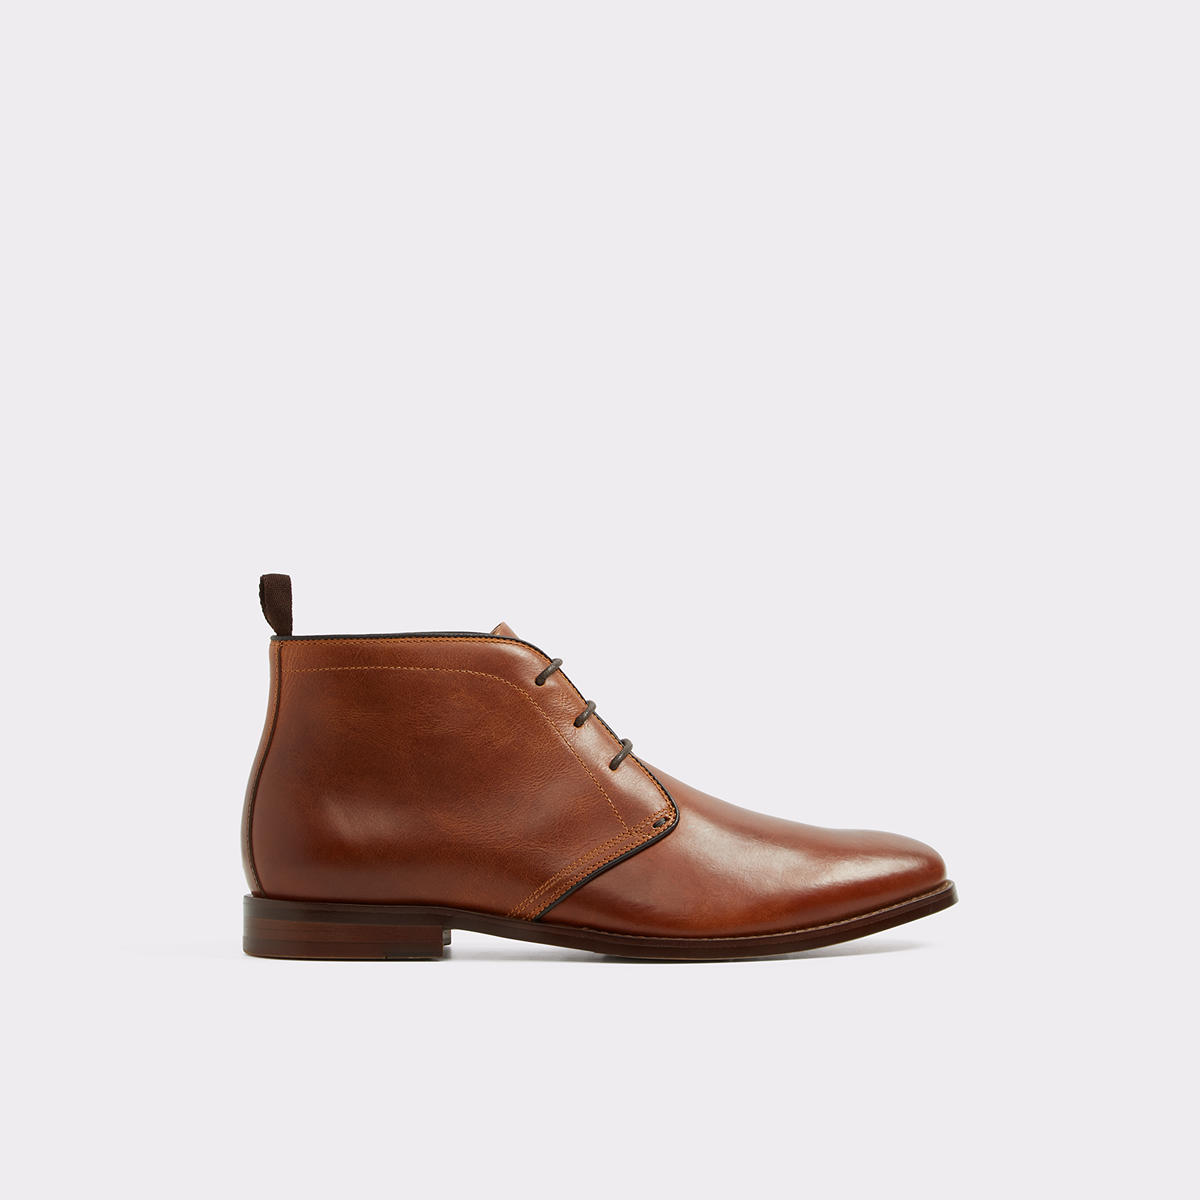 f54e759a1bb Aroanna Cognac Men s Formal boots